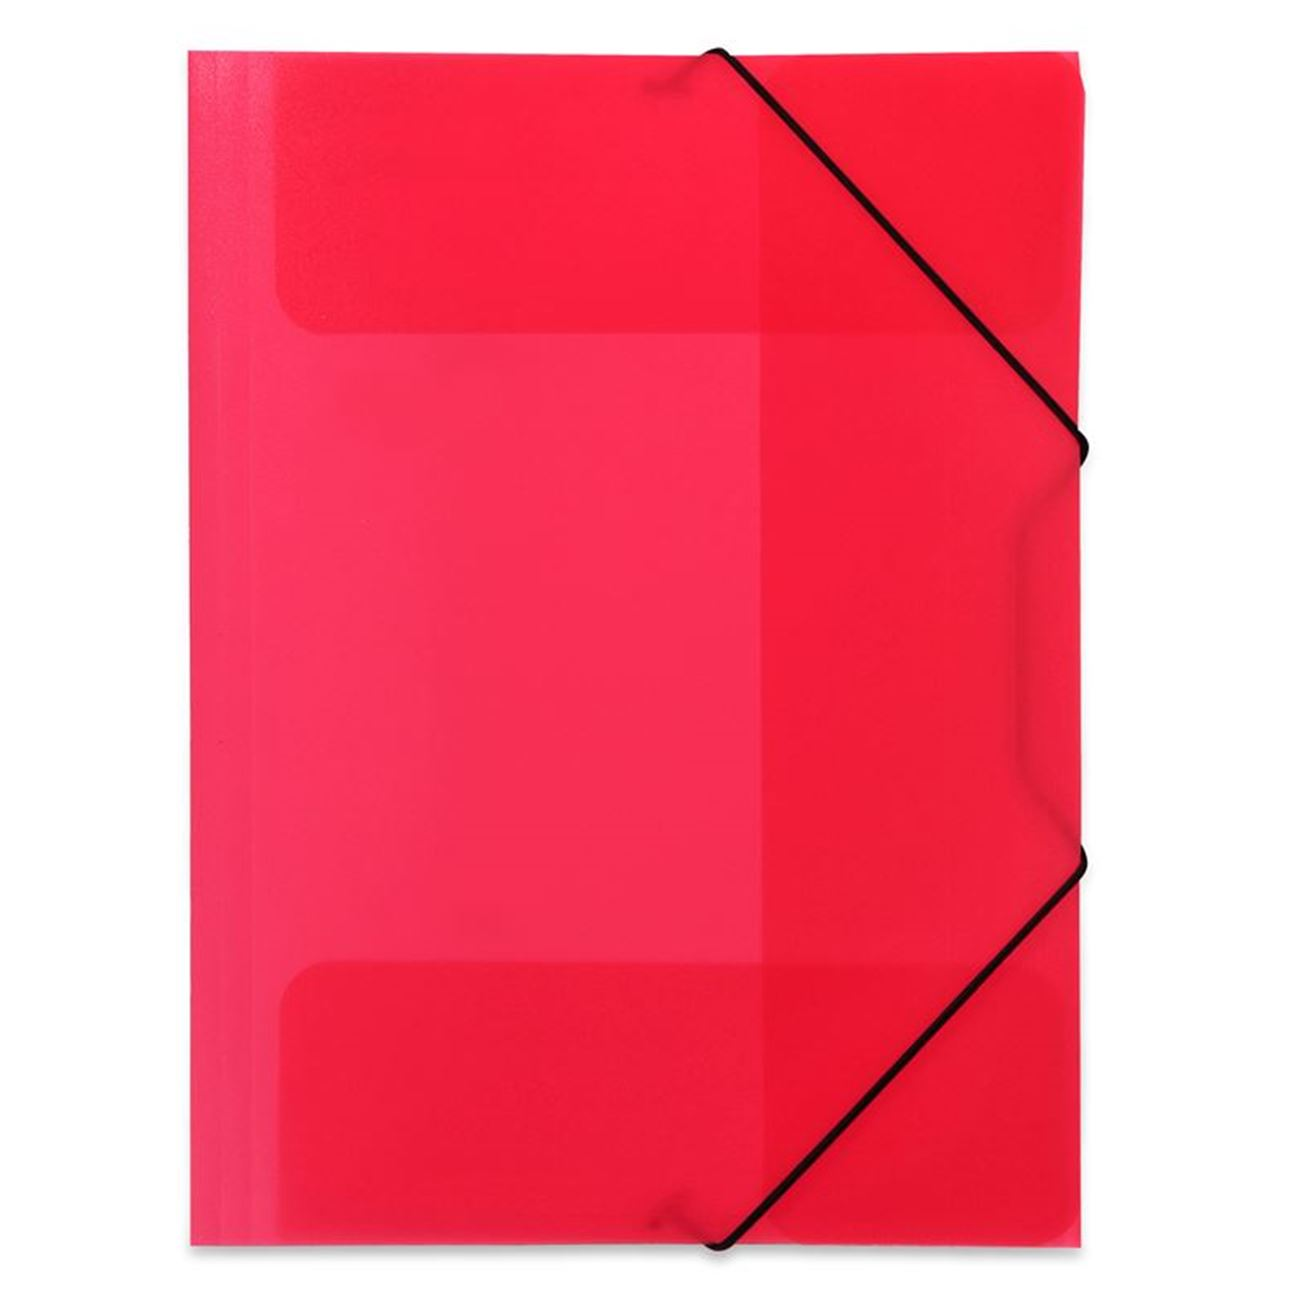 OfficeSpot Ντοσιέ με Λάστιχο Πλαστικό Κόκκινο